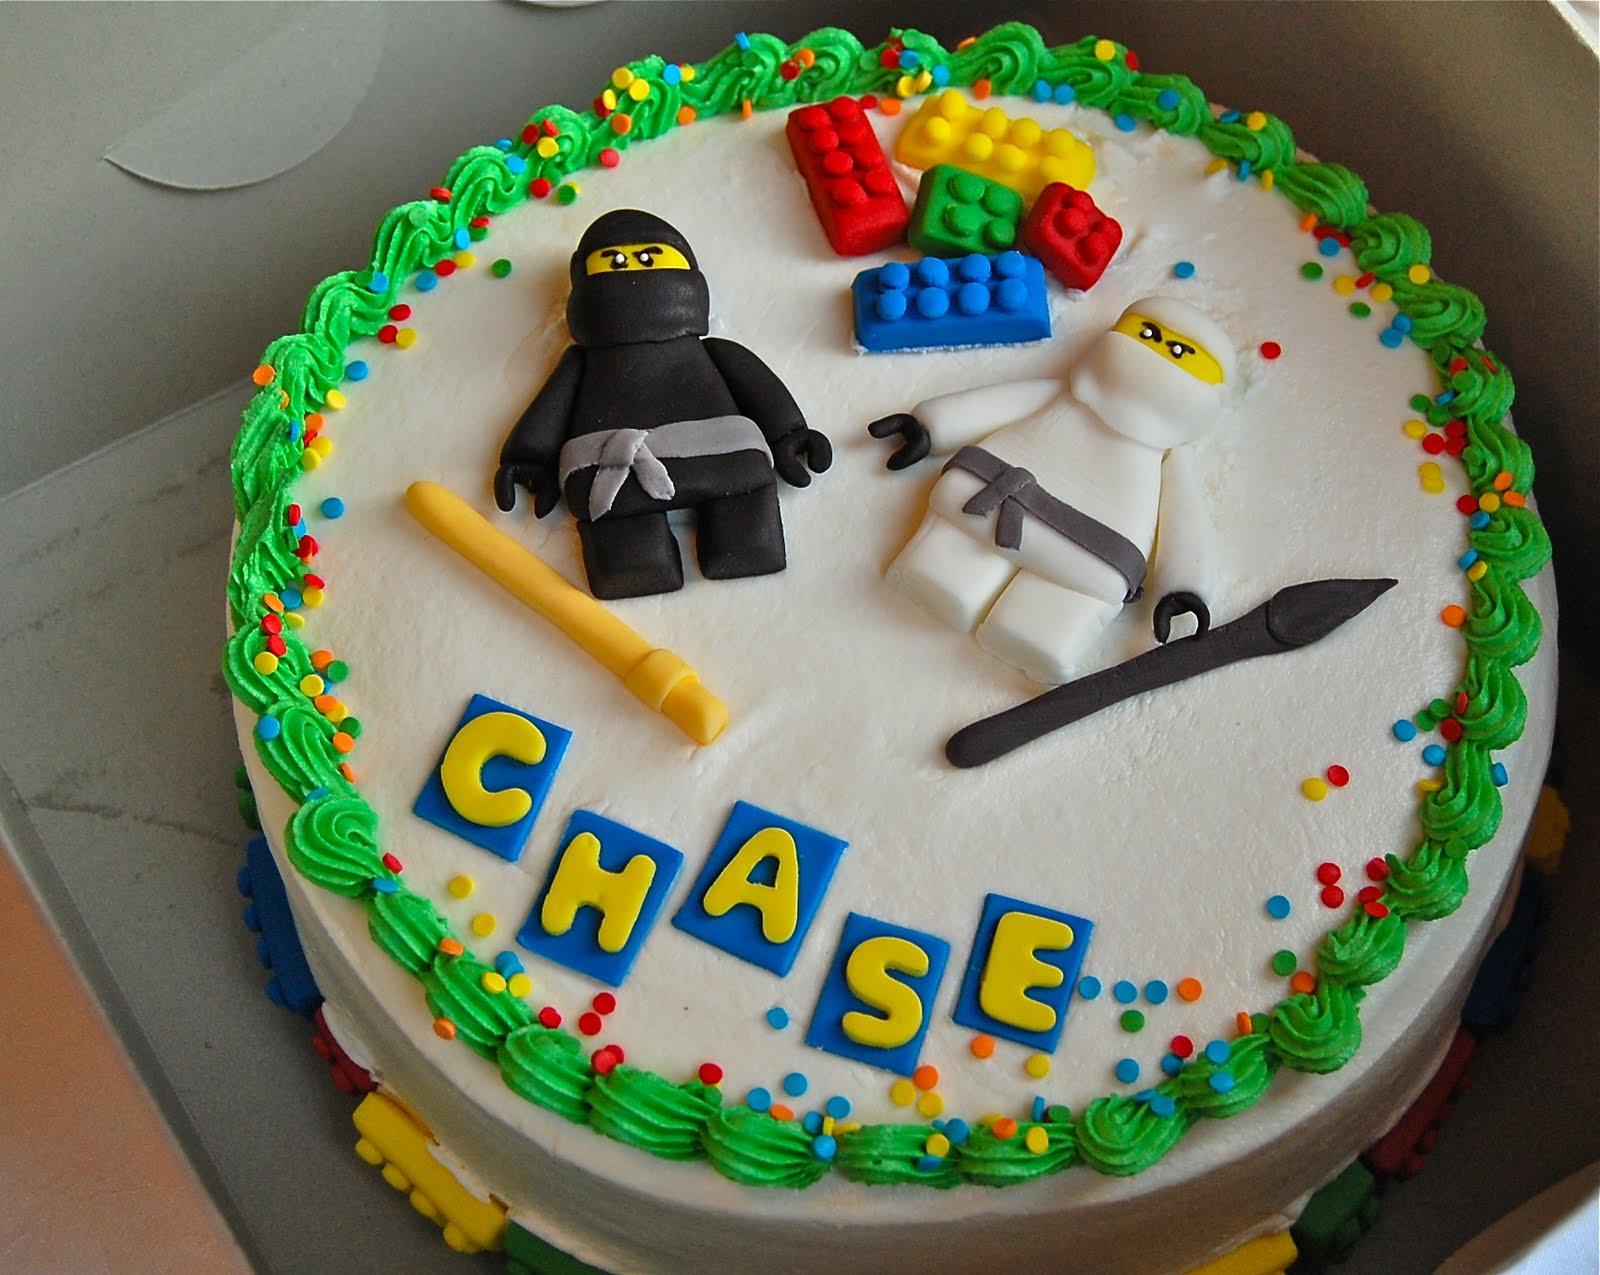 Lego Birthday Cake Cake Ideas And Designs